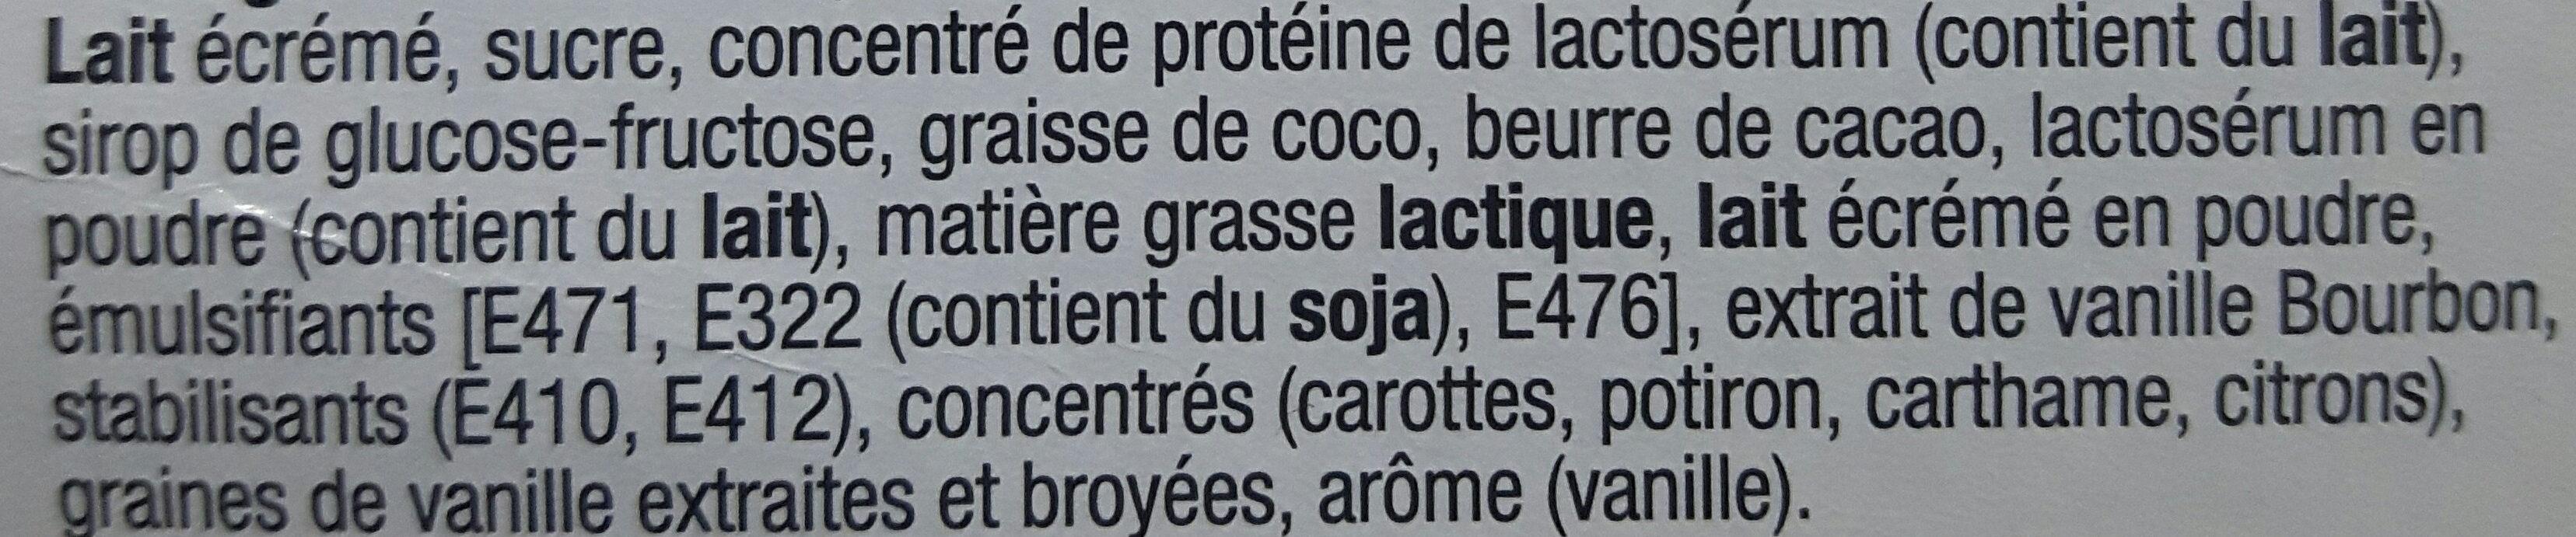 Glaces à la vanille - Ingrediënten - fr